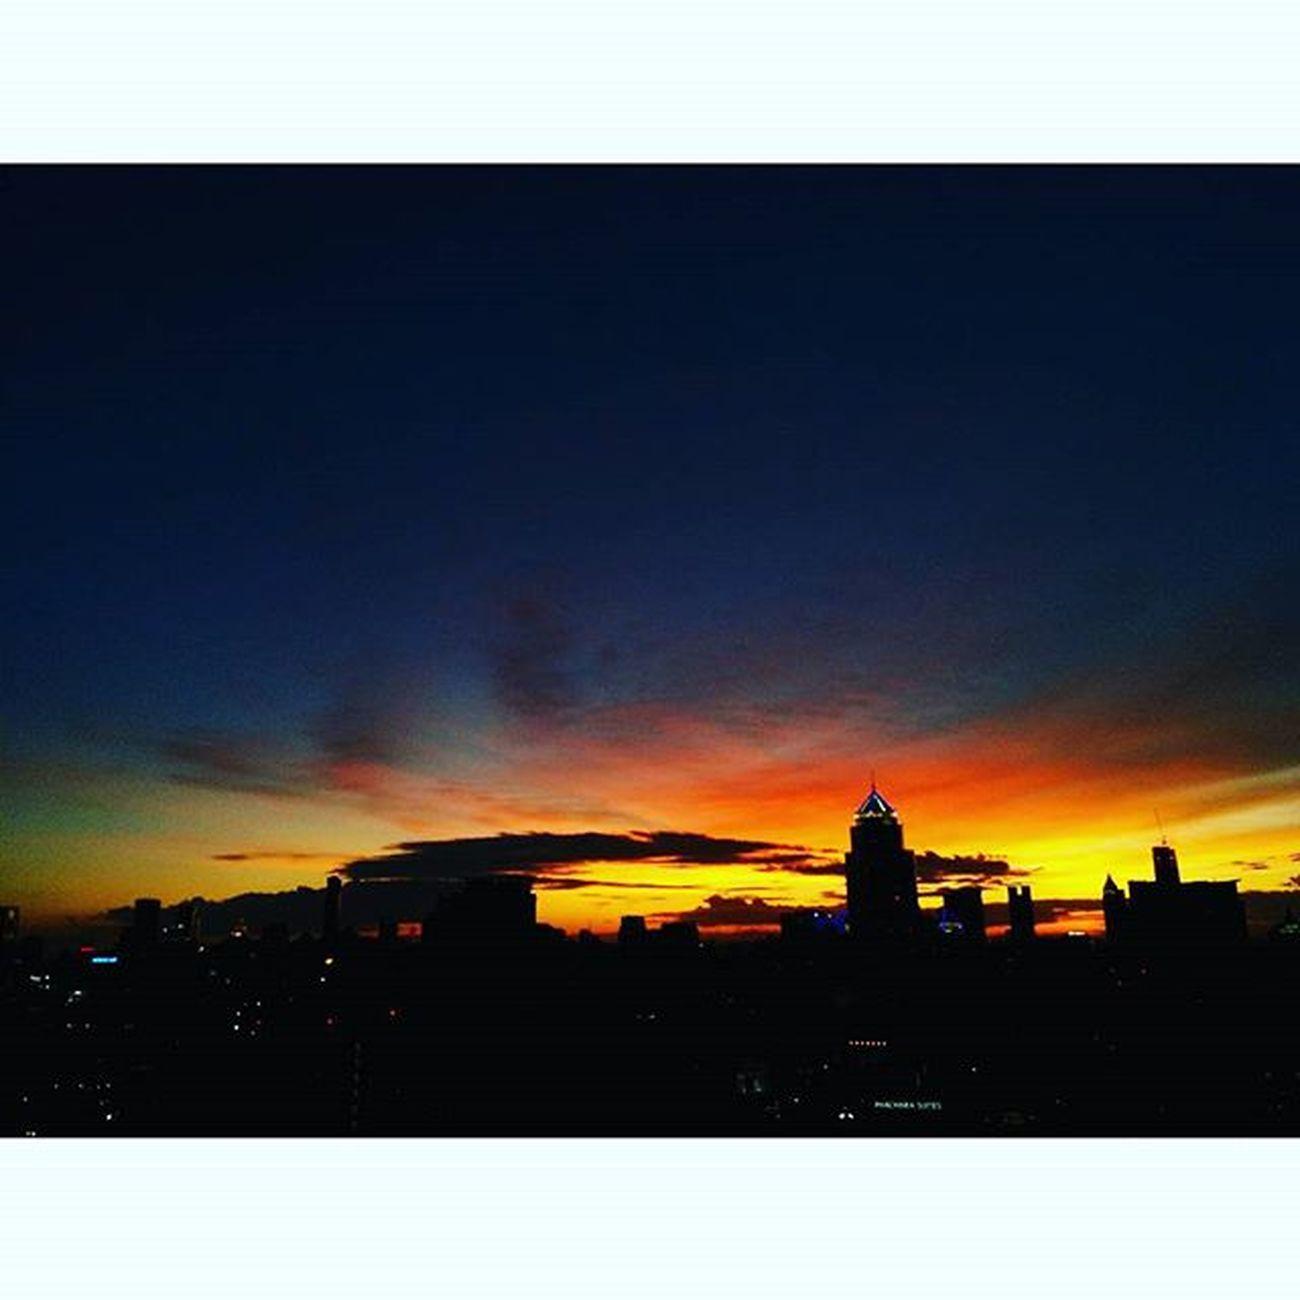 R u looking at the same sky as me? My Monday sunset is so stunning!! Sunset Sunlight Sun Sky Skyviewer Bangkok Bangkokskyline Santitasphotography